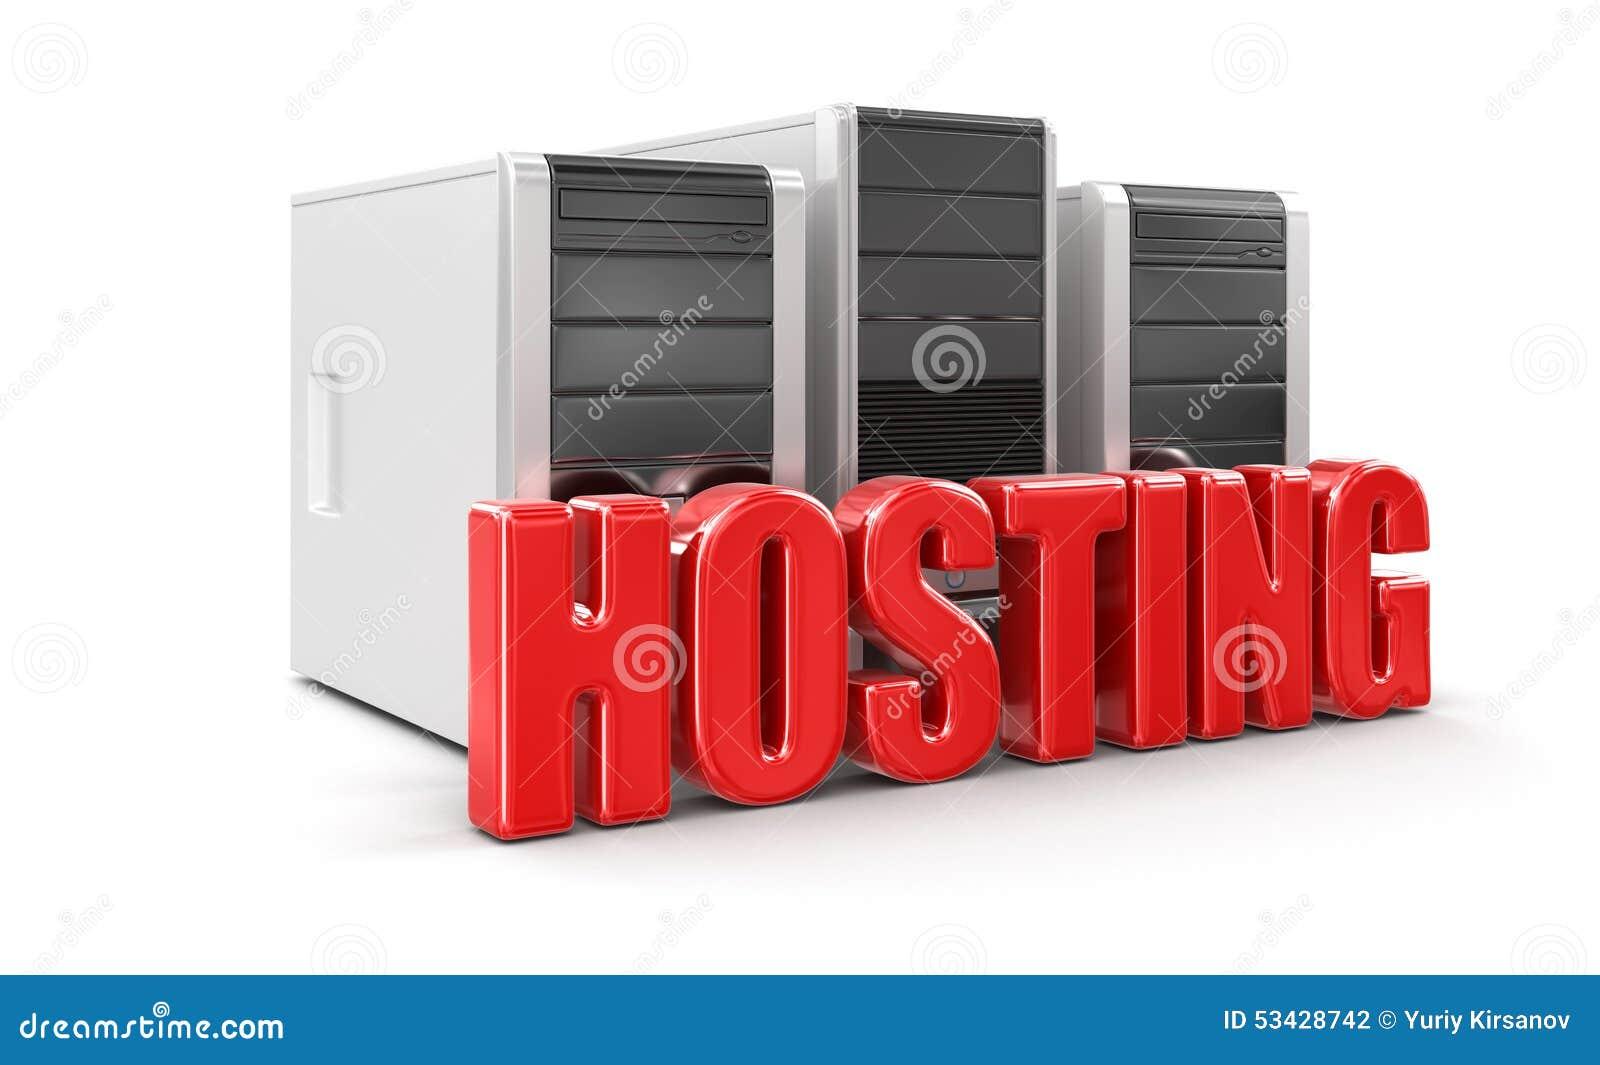 Компьютеры хостинг виртуальный хостинг аренда